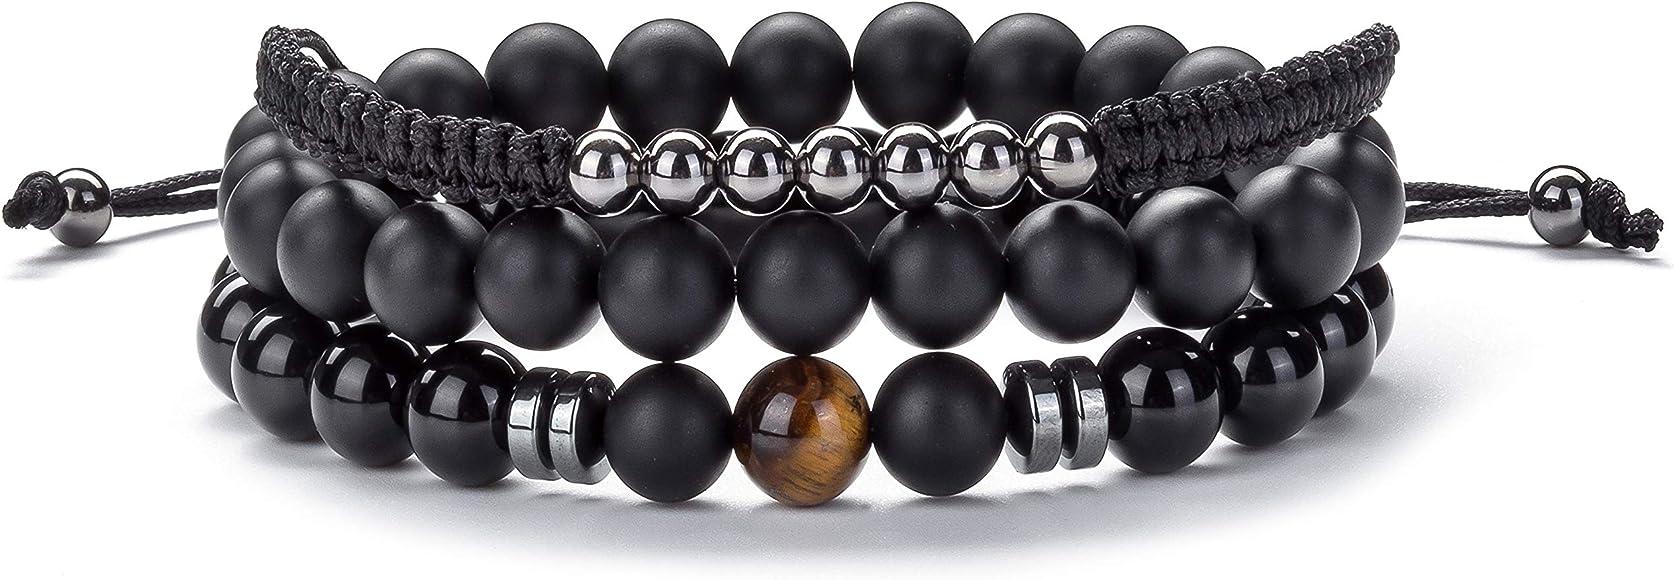 ac7669d1290 Hamoery Men Women 8mm Lava Rock Wrap Bracelet Braided Rope Natural Stone  Stack Bracelet Bangle Set